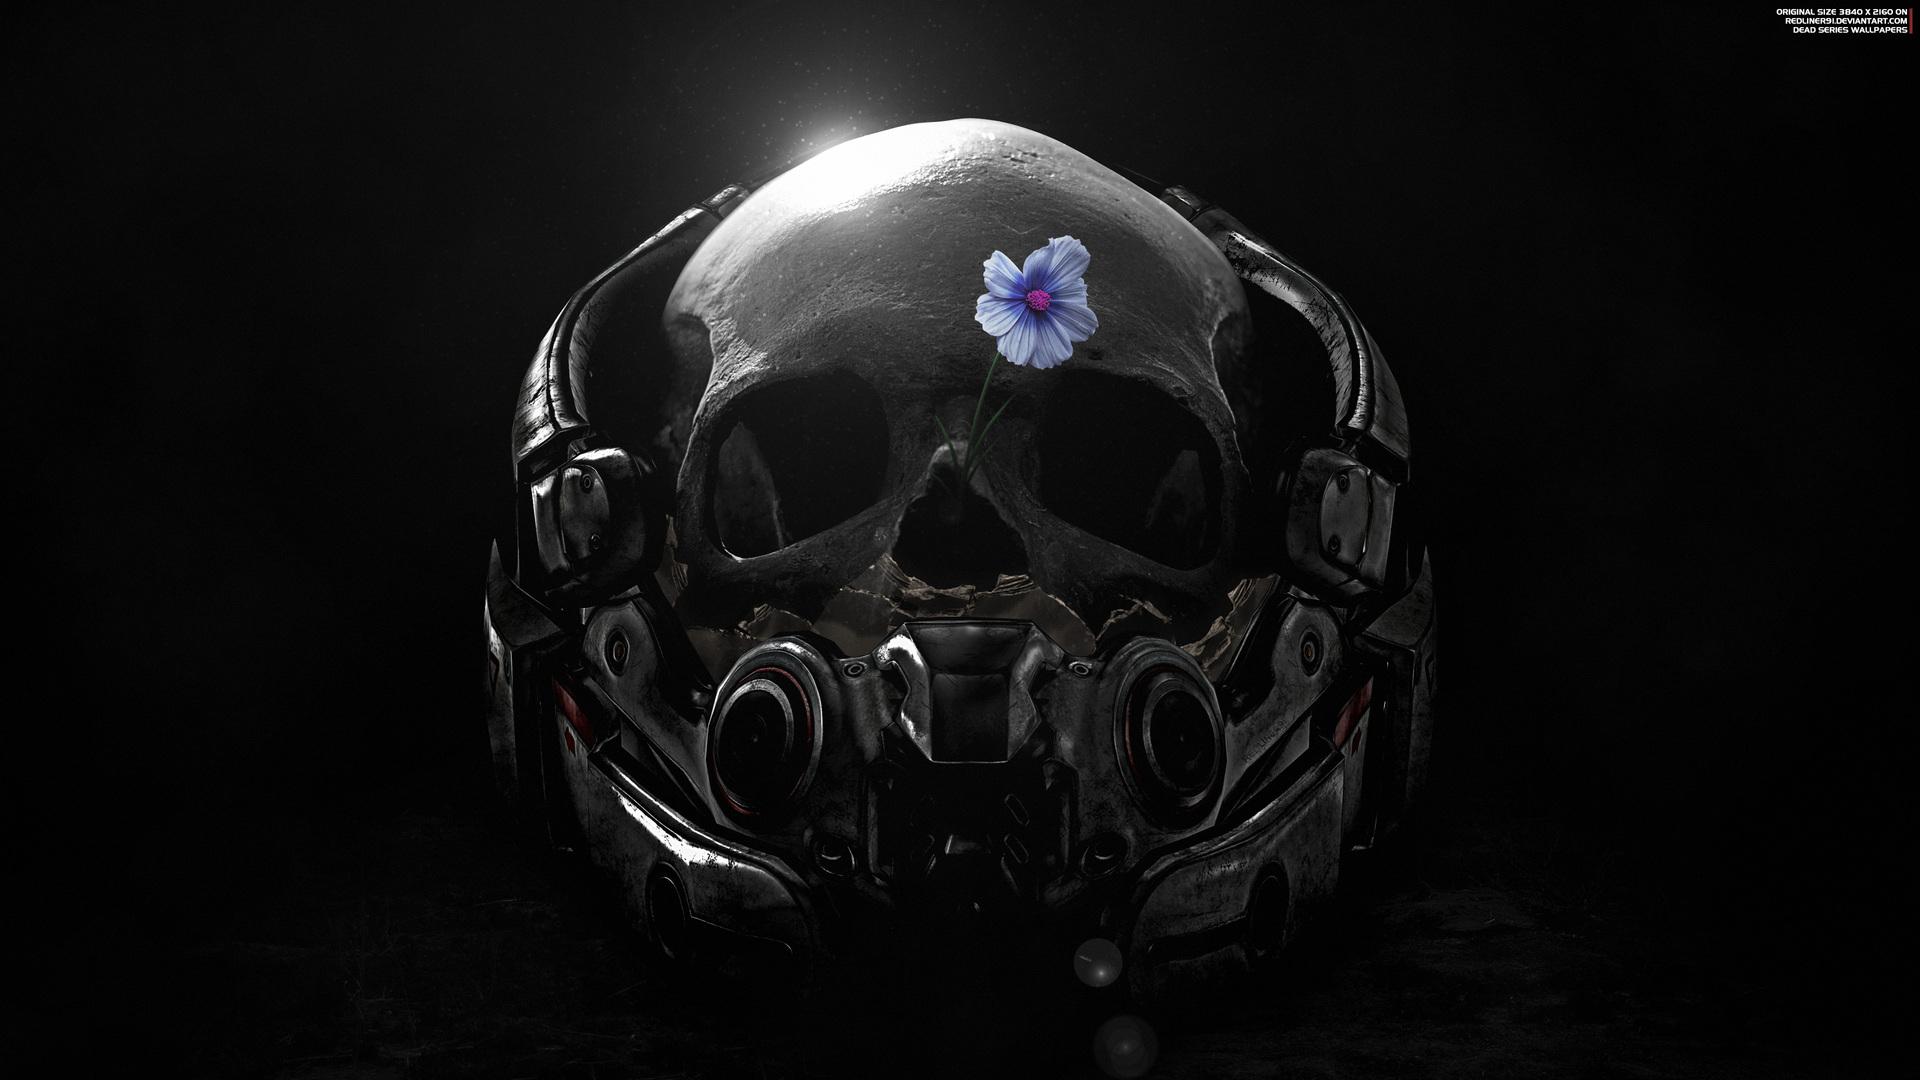 1920x1080 mass effect andromeda skull flower fanart 4k laptop full hd 1080p hd 4k wallpapers - Mass effect andromeda 1920x1080 ...